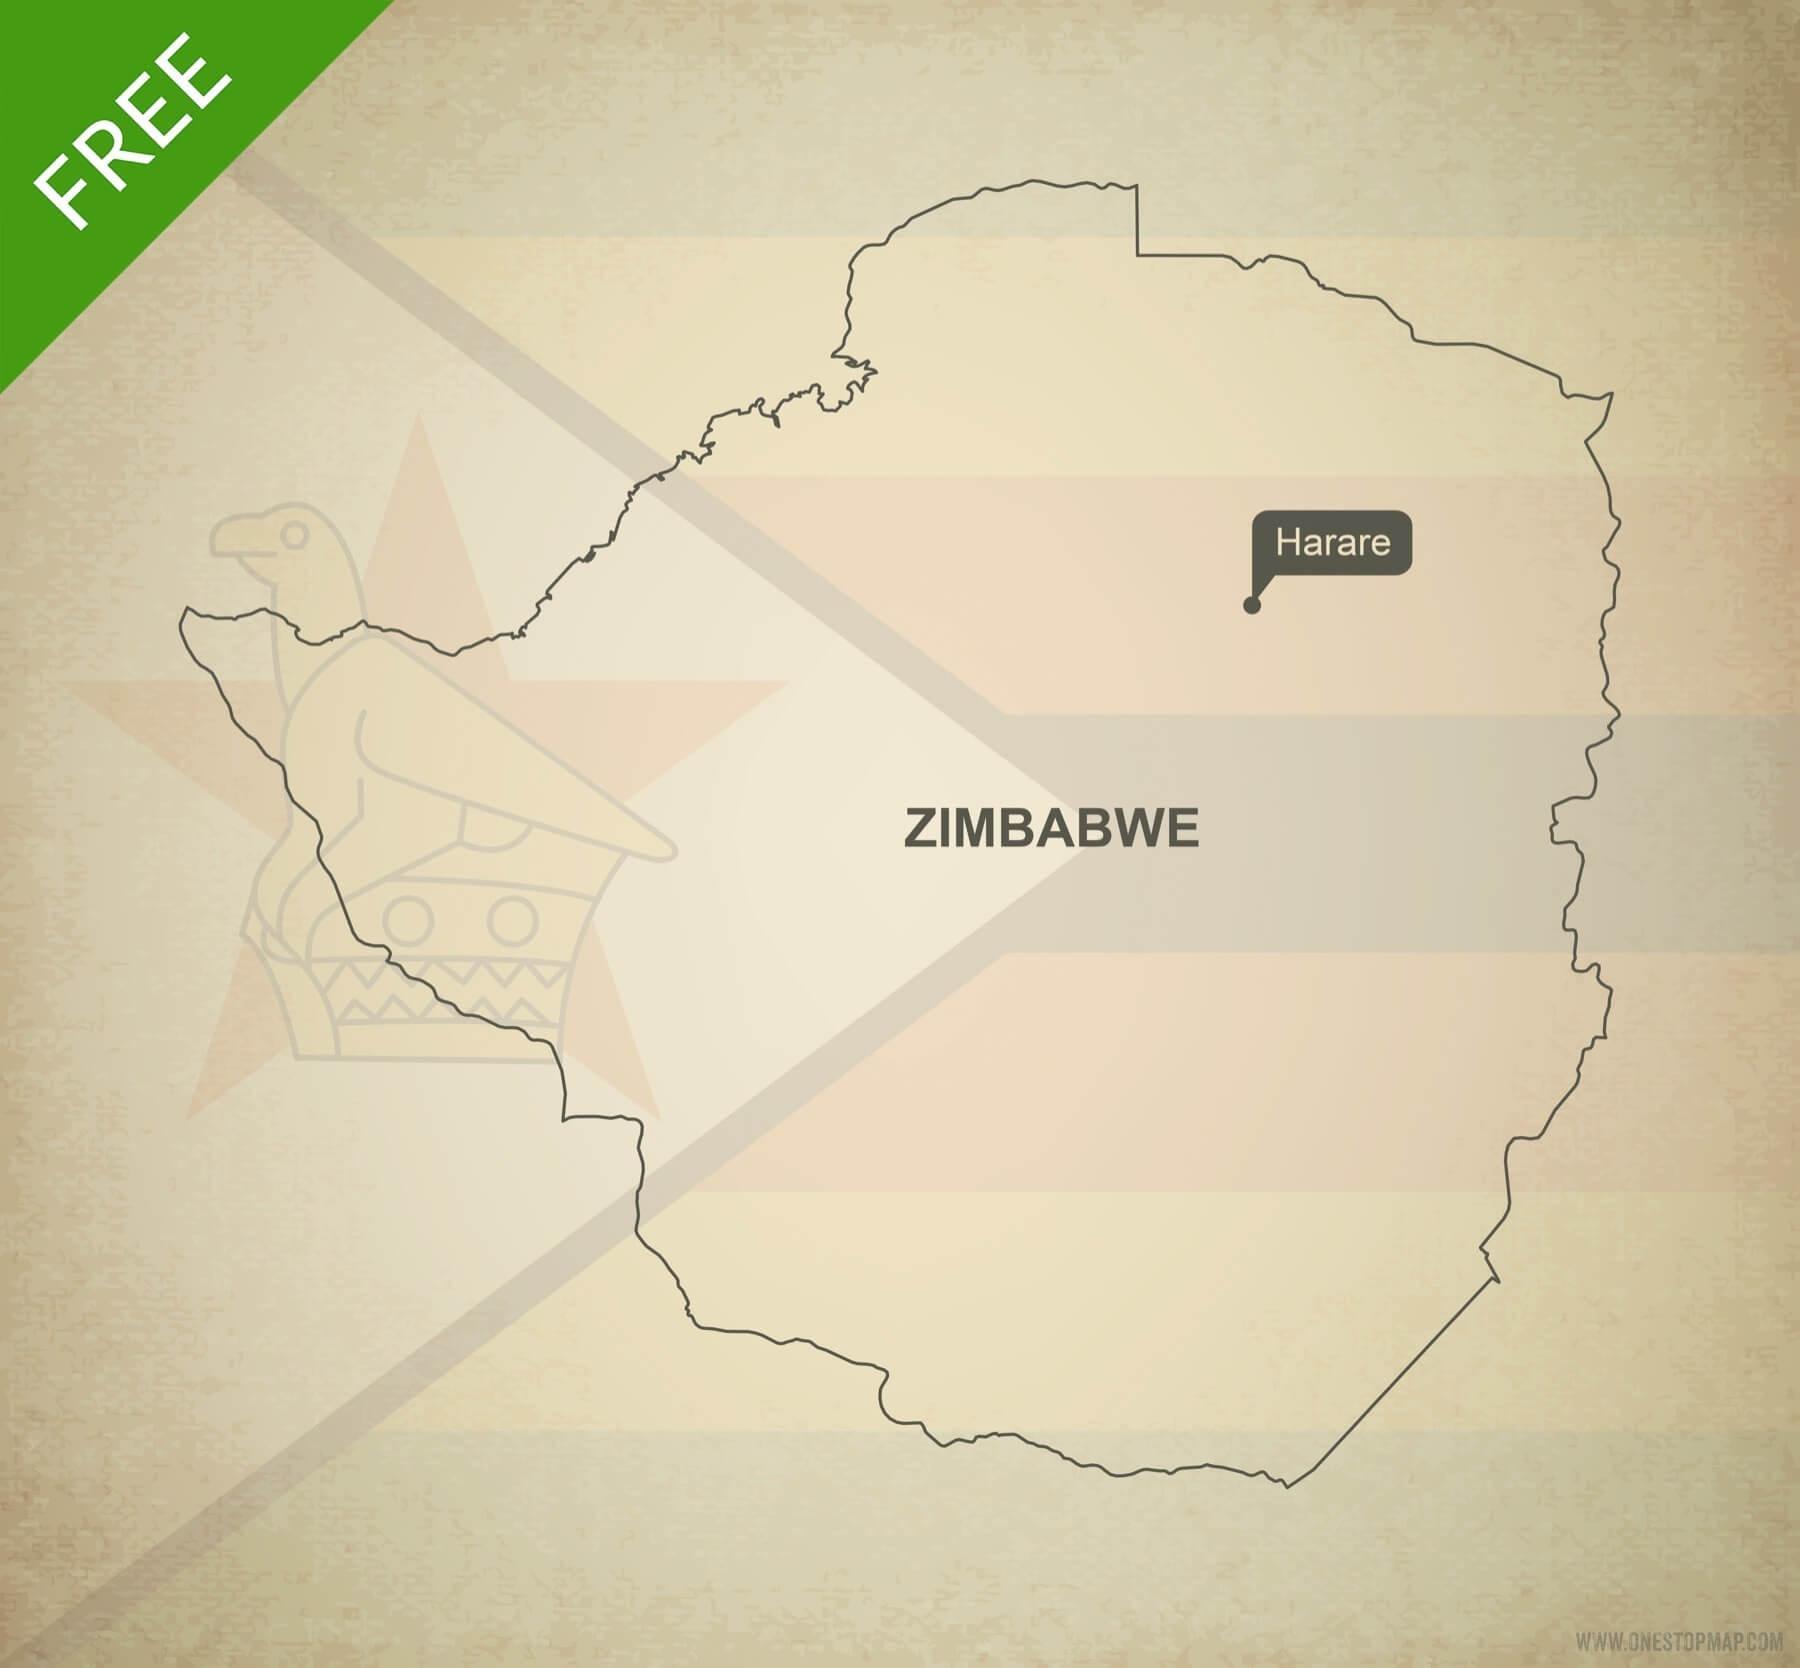 Free vector map of Zimbabwe outline